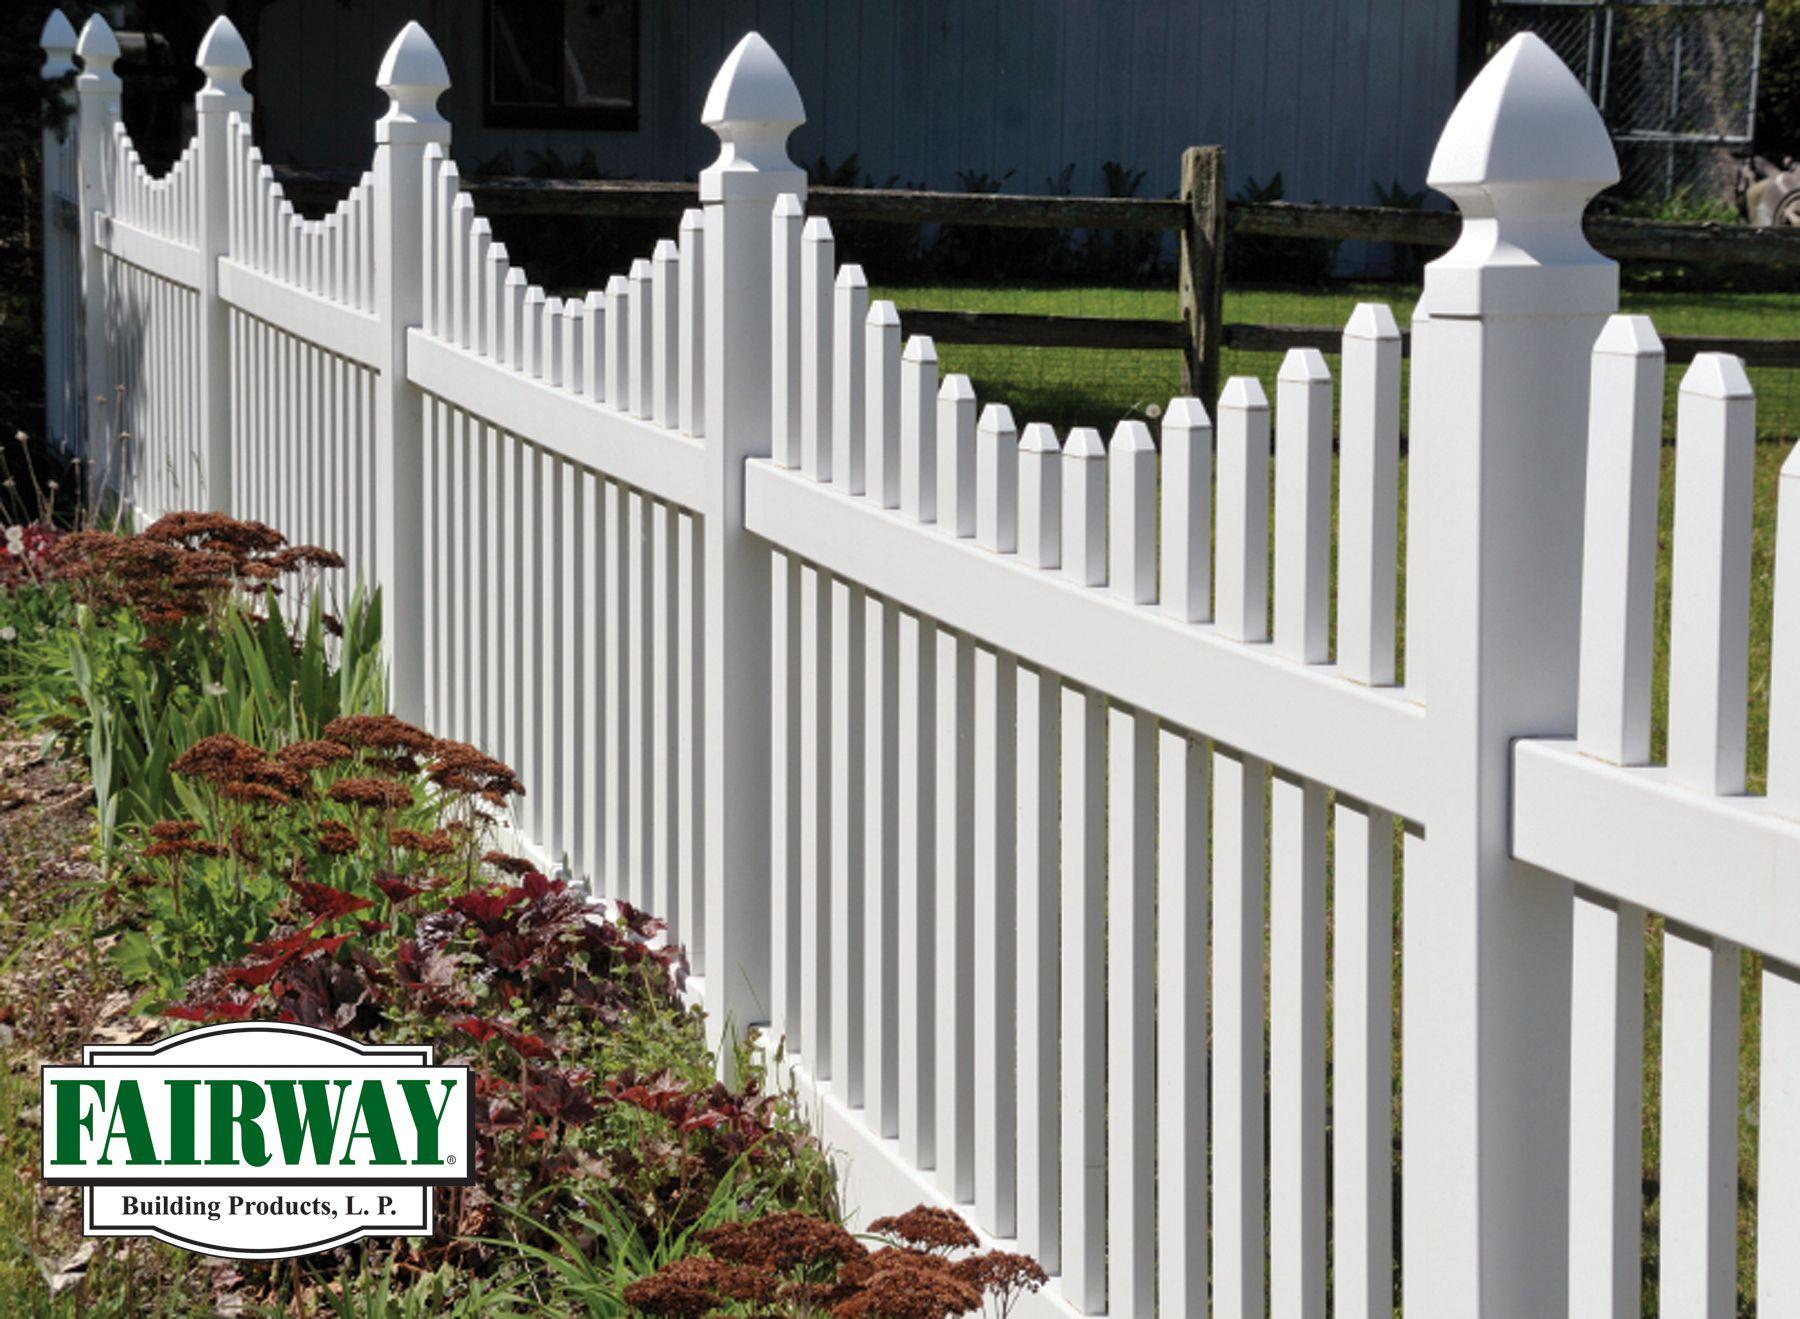 vinyl picket fence front yard. Fairway Vinyl Scalloped Picket Fence Front Yard F